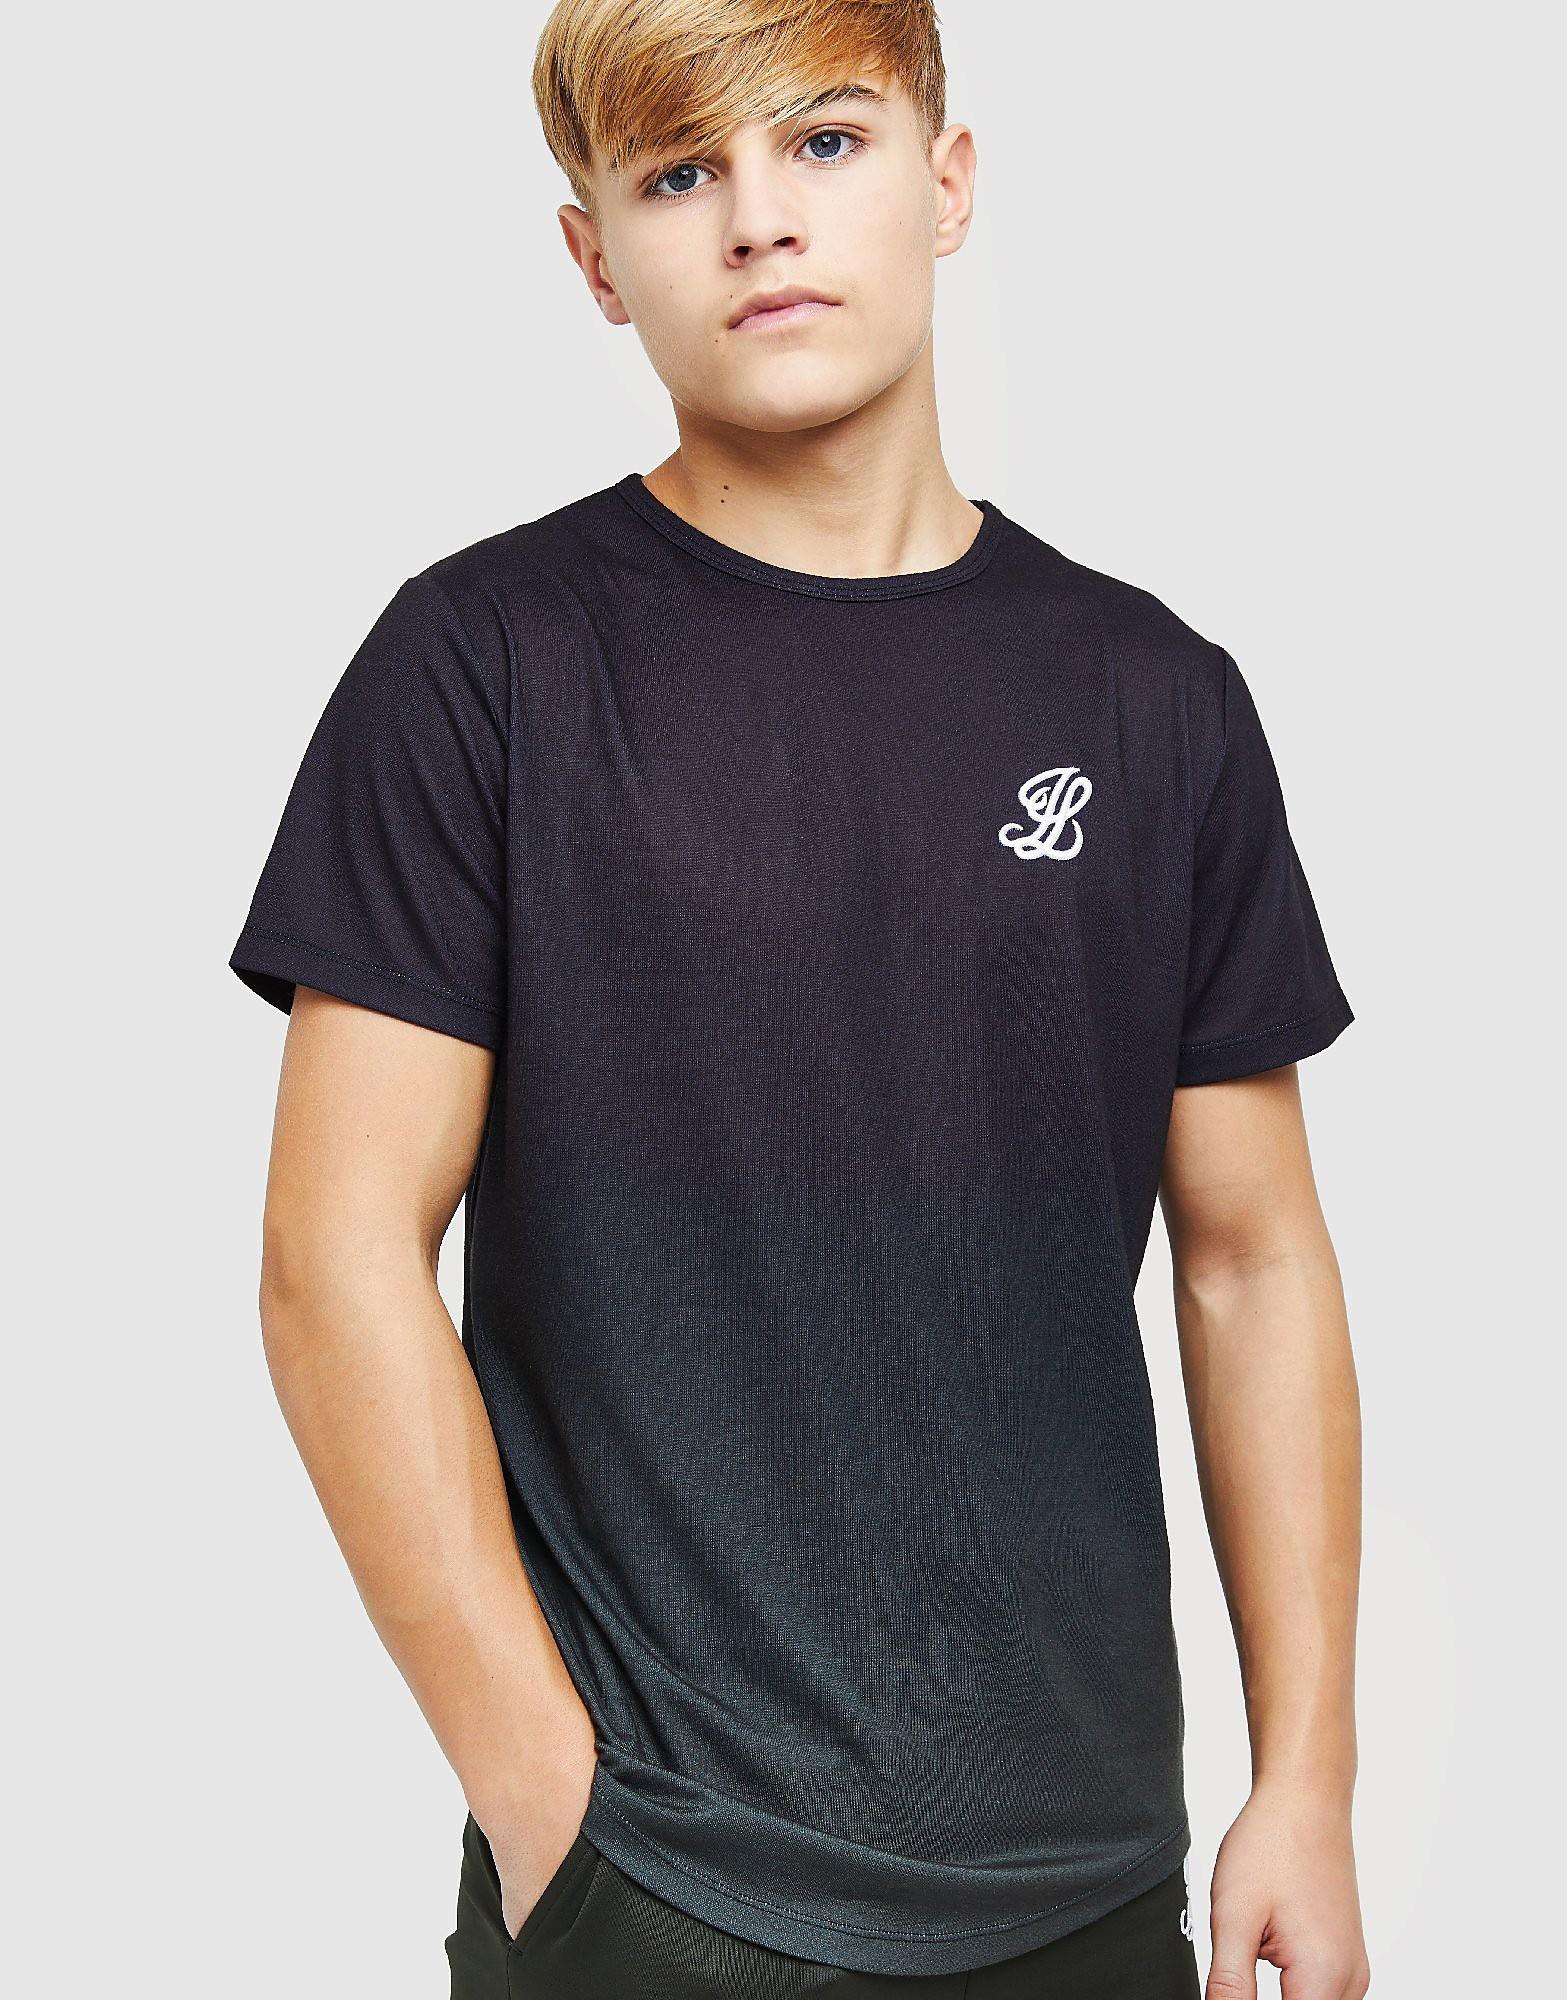 ILLUSIVE LONDON Fade T-Shirt Junior - alleen bij JD - Zwart - Kind